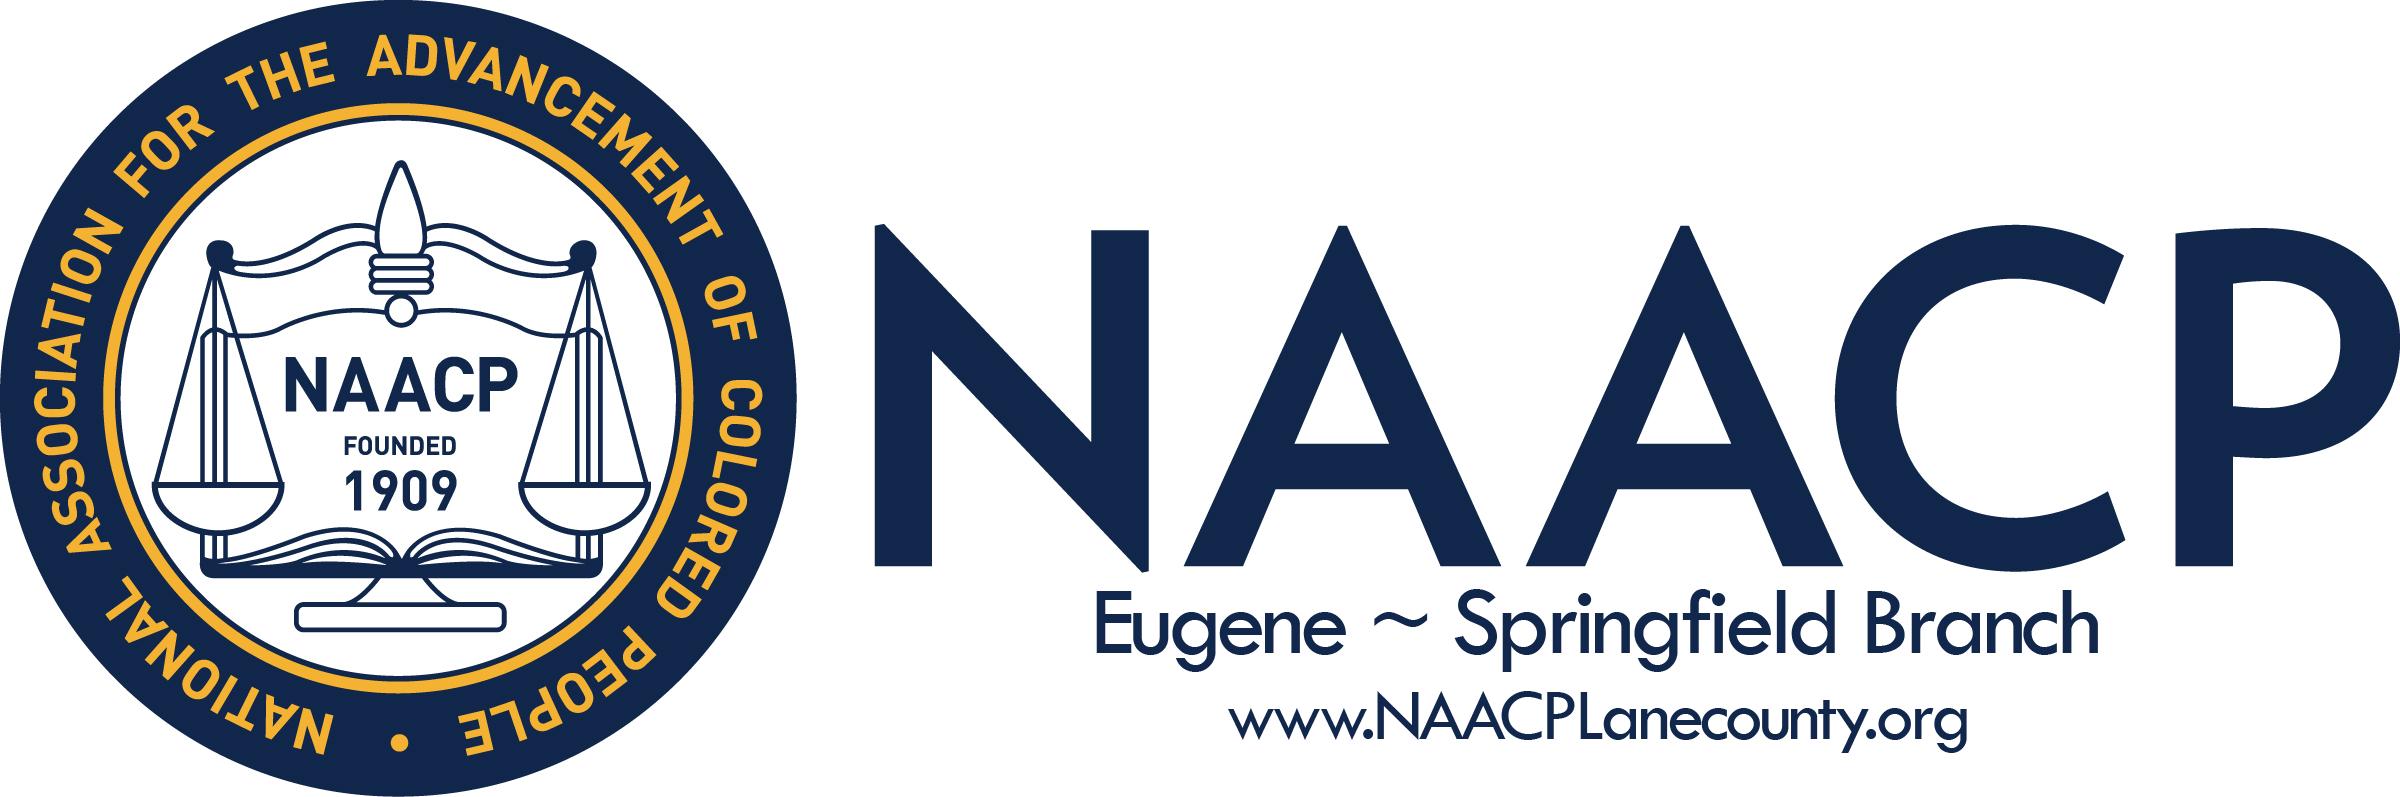 NAACP-website.png